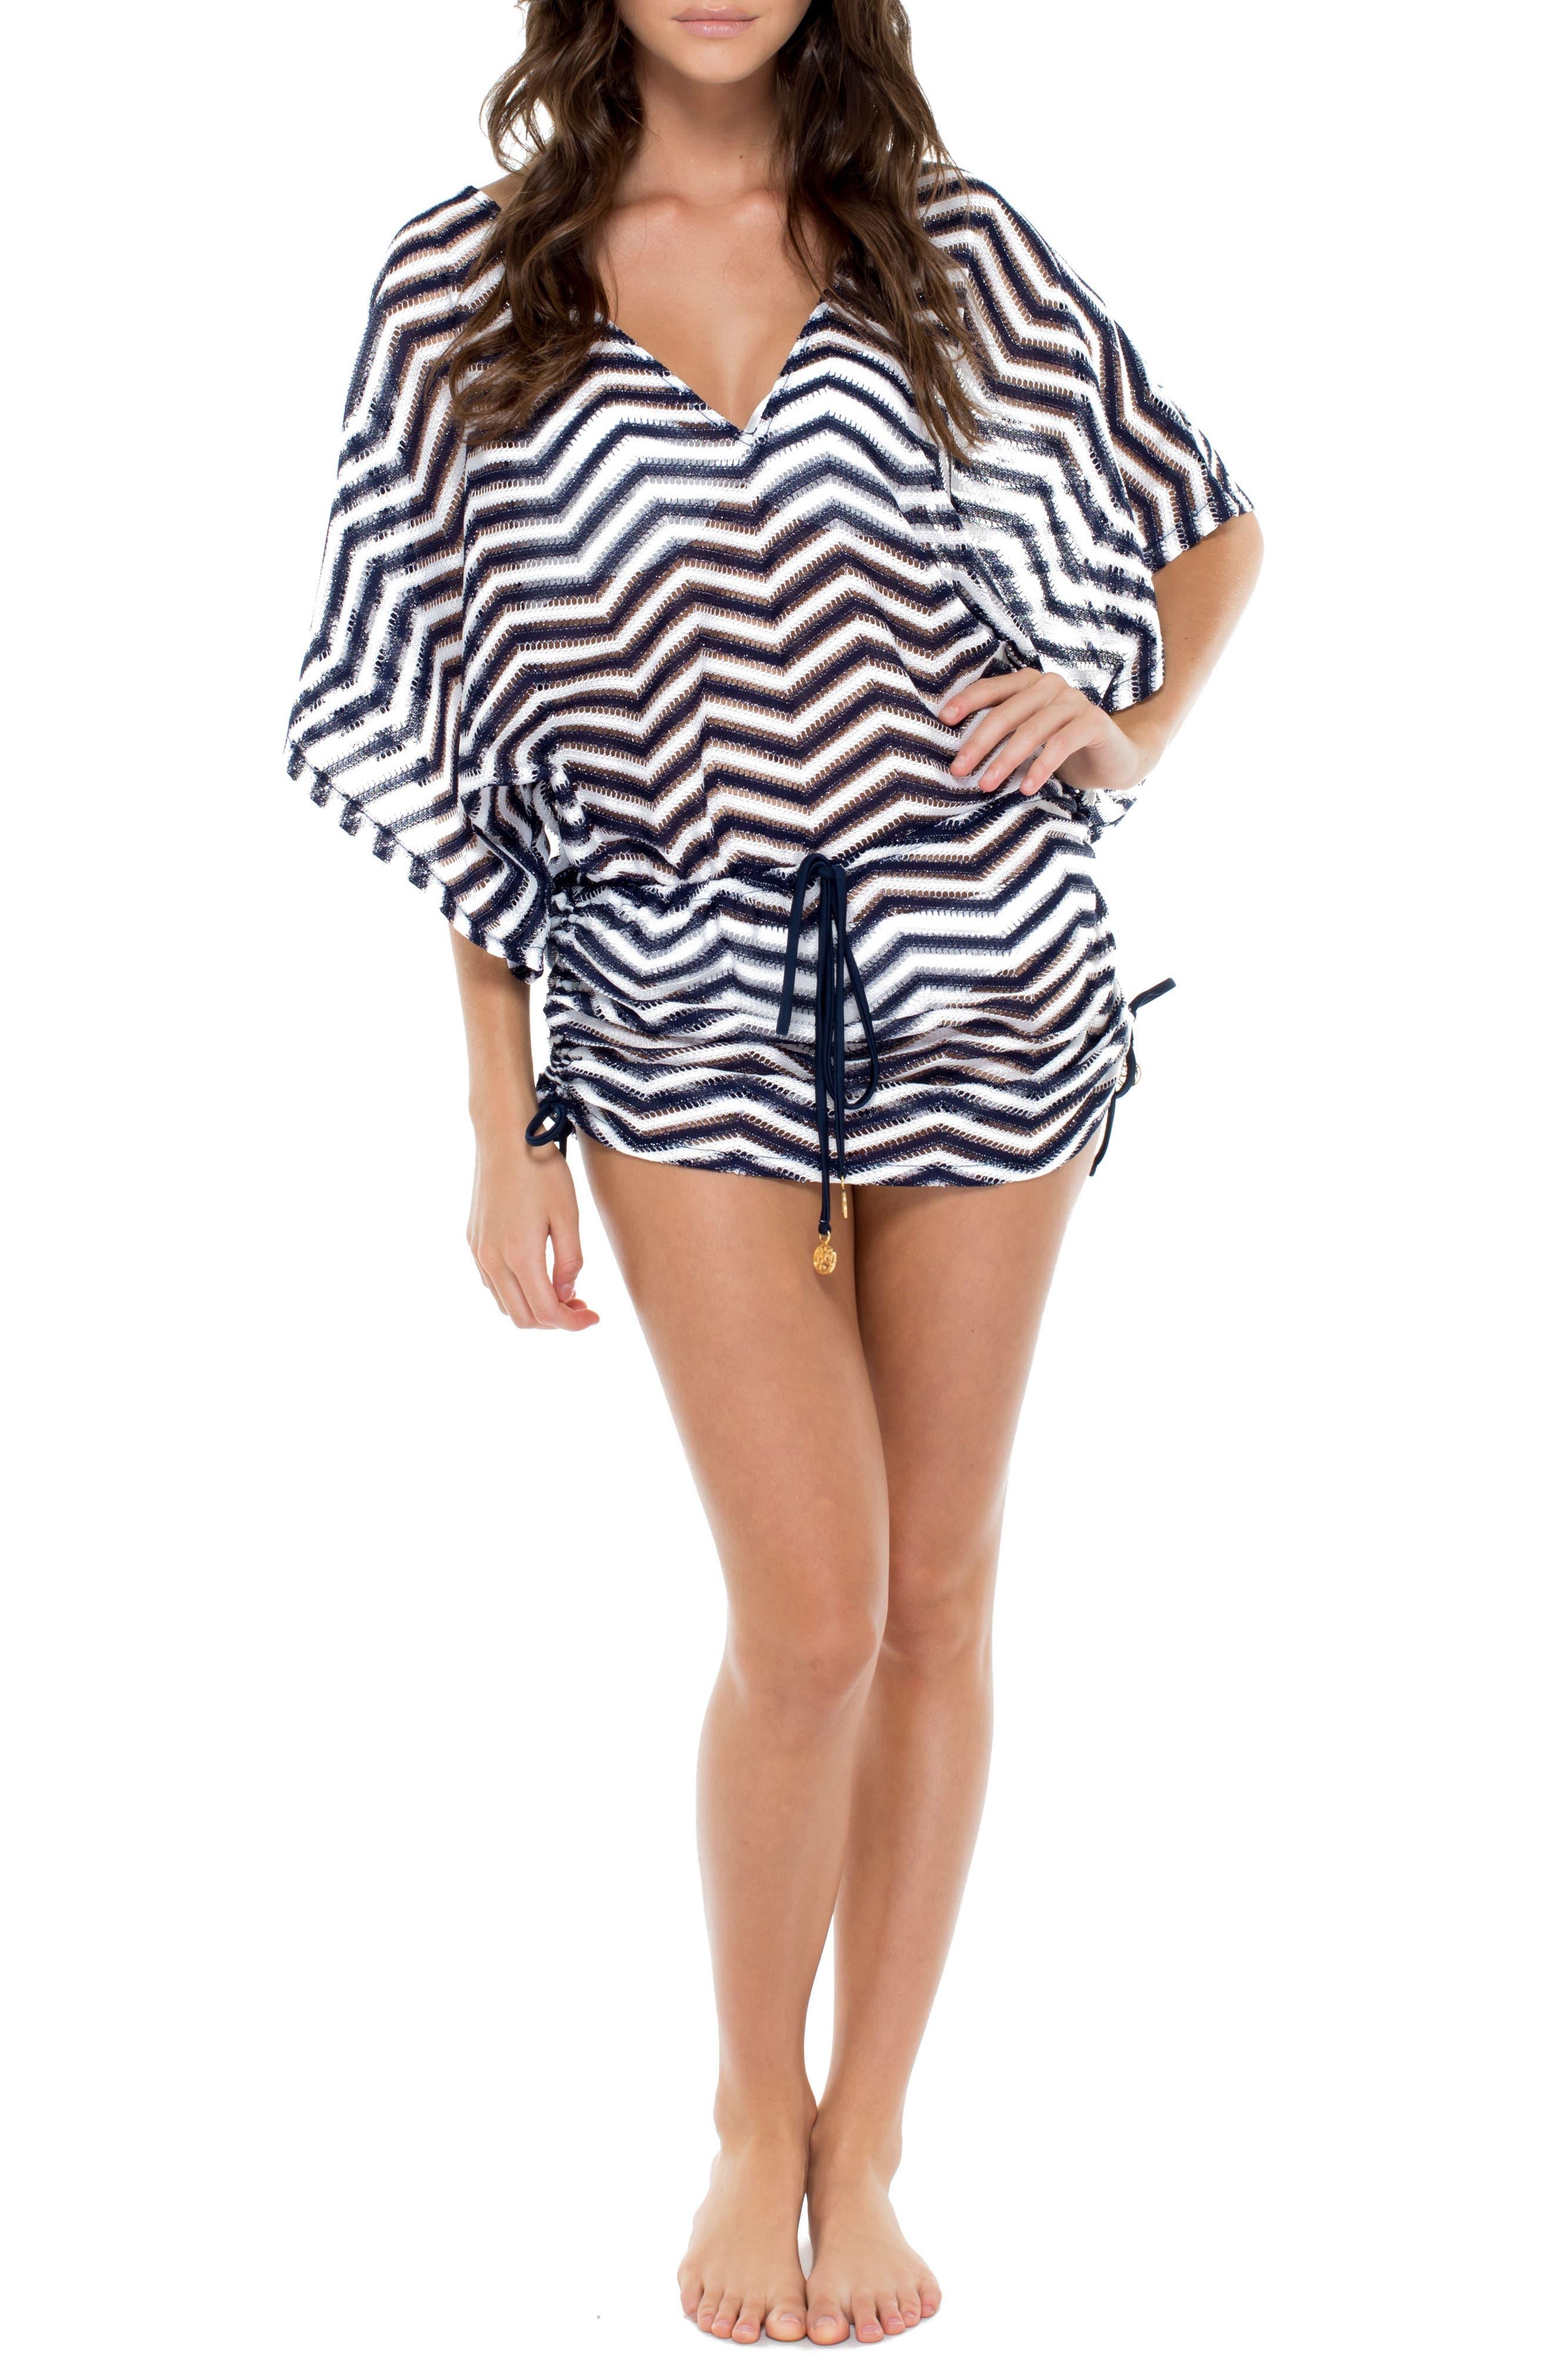 Main Image - Luli Fama Cabana Cover-Up Dress